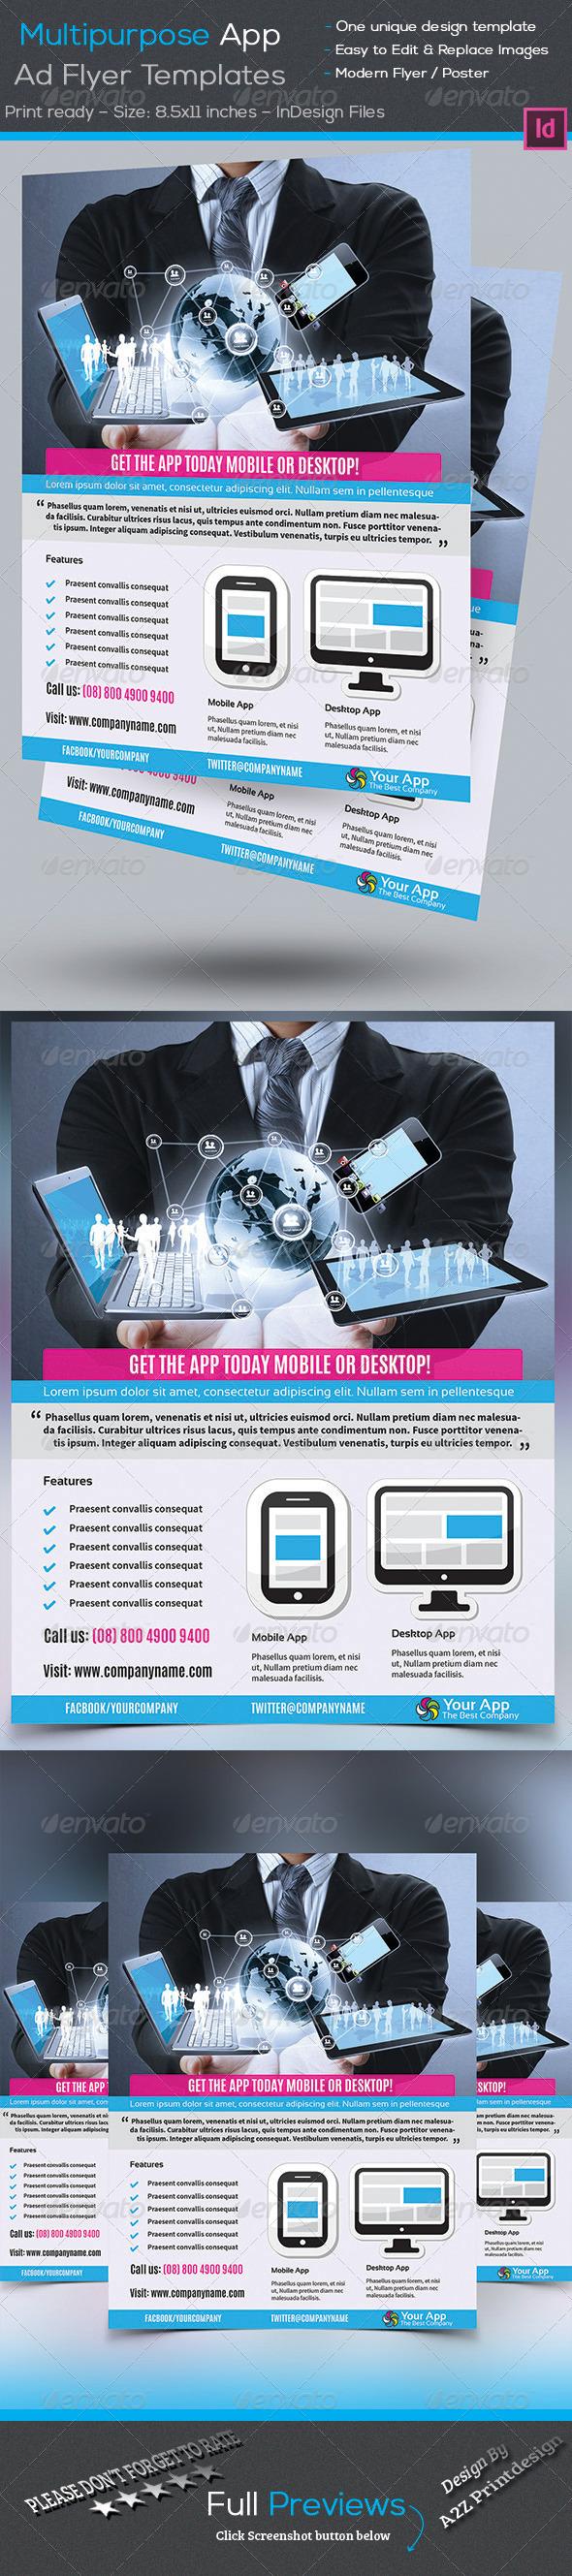 GraphicRiver Multipurpose App Flyer 7910255